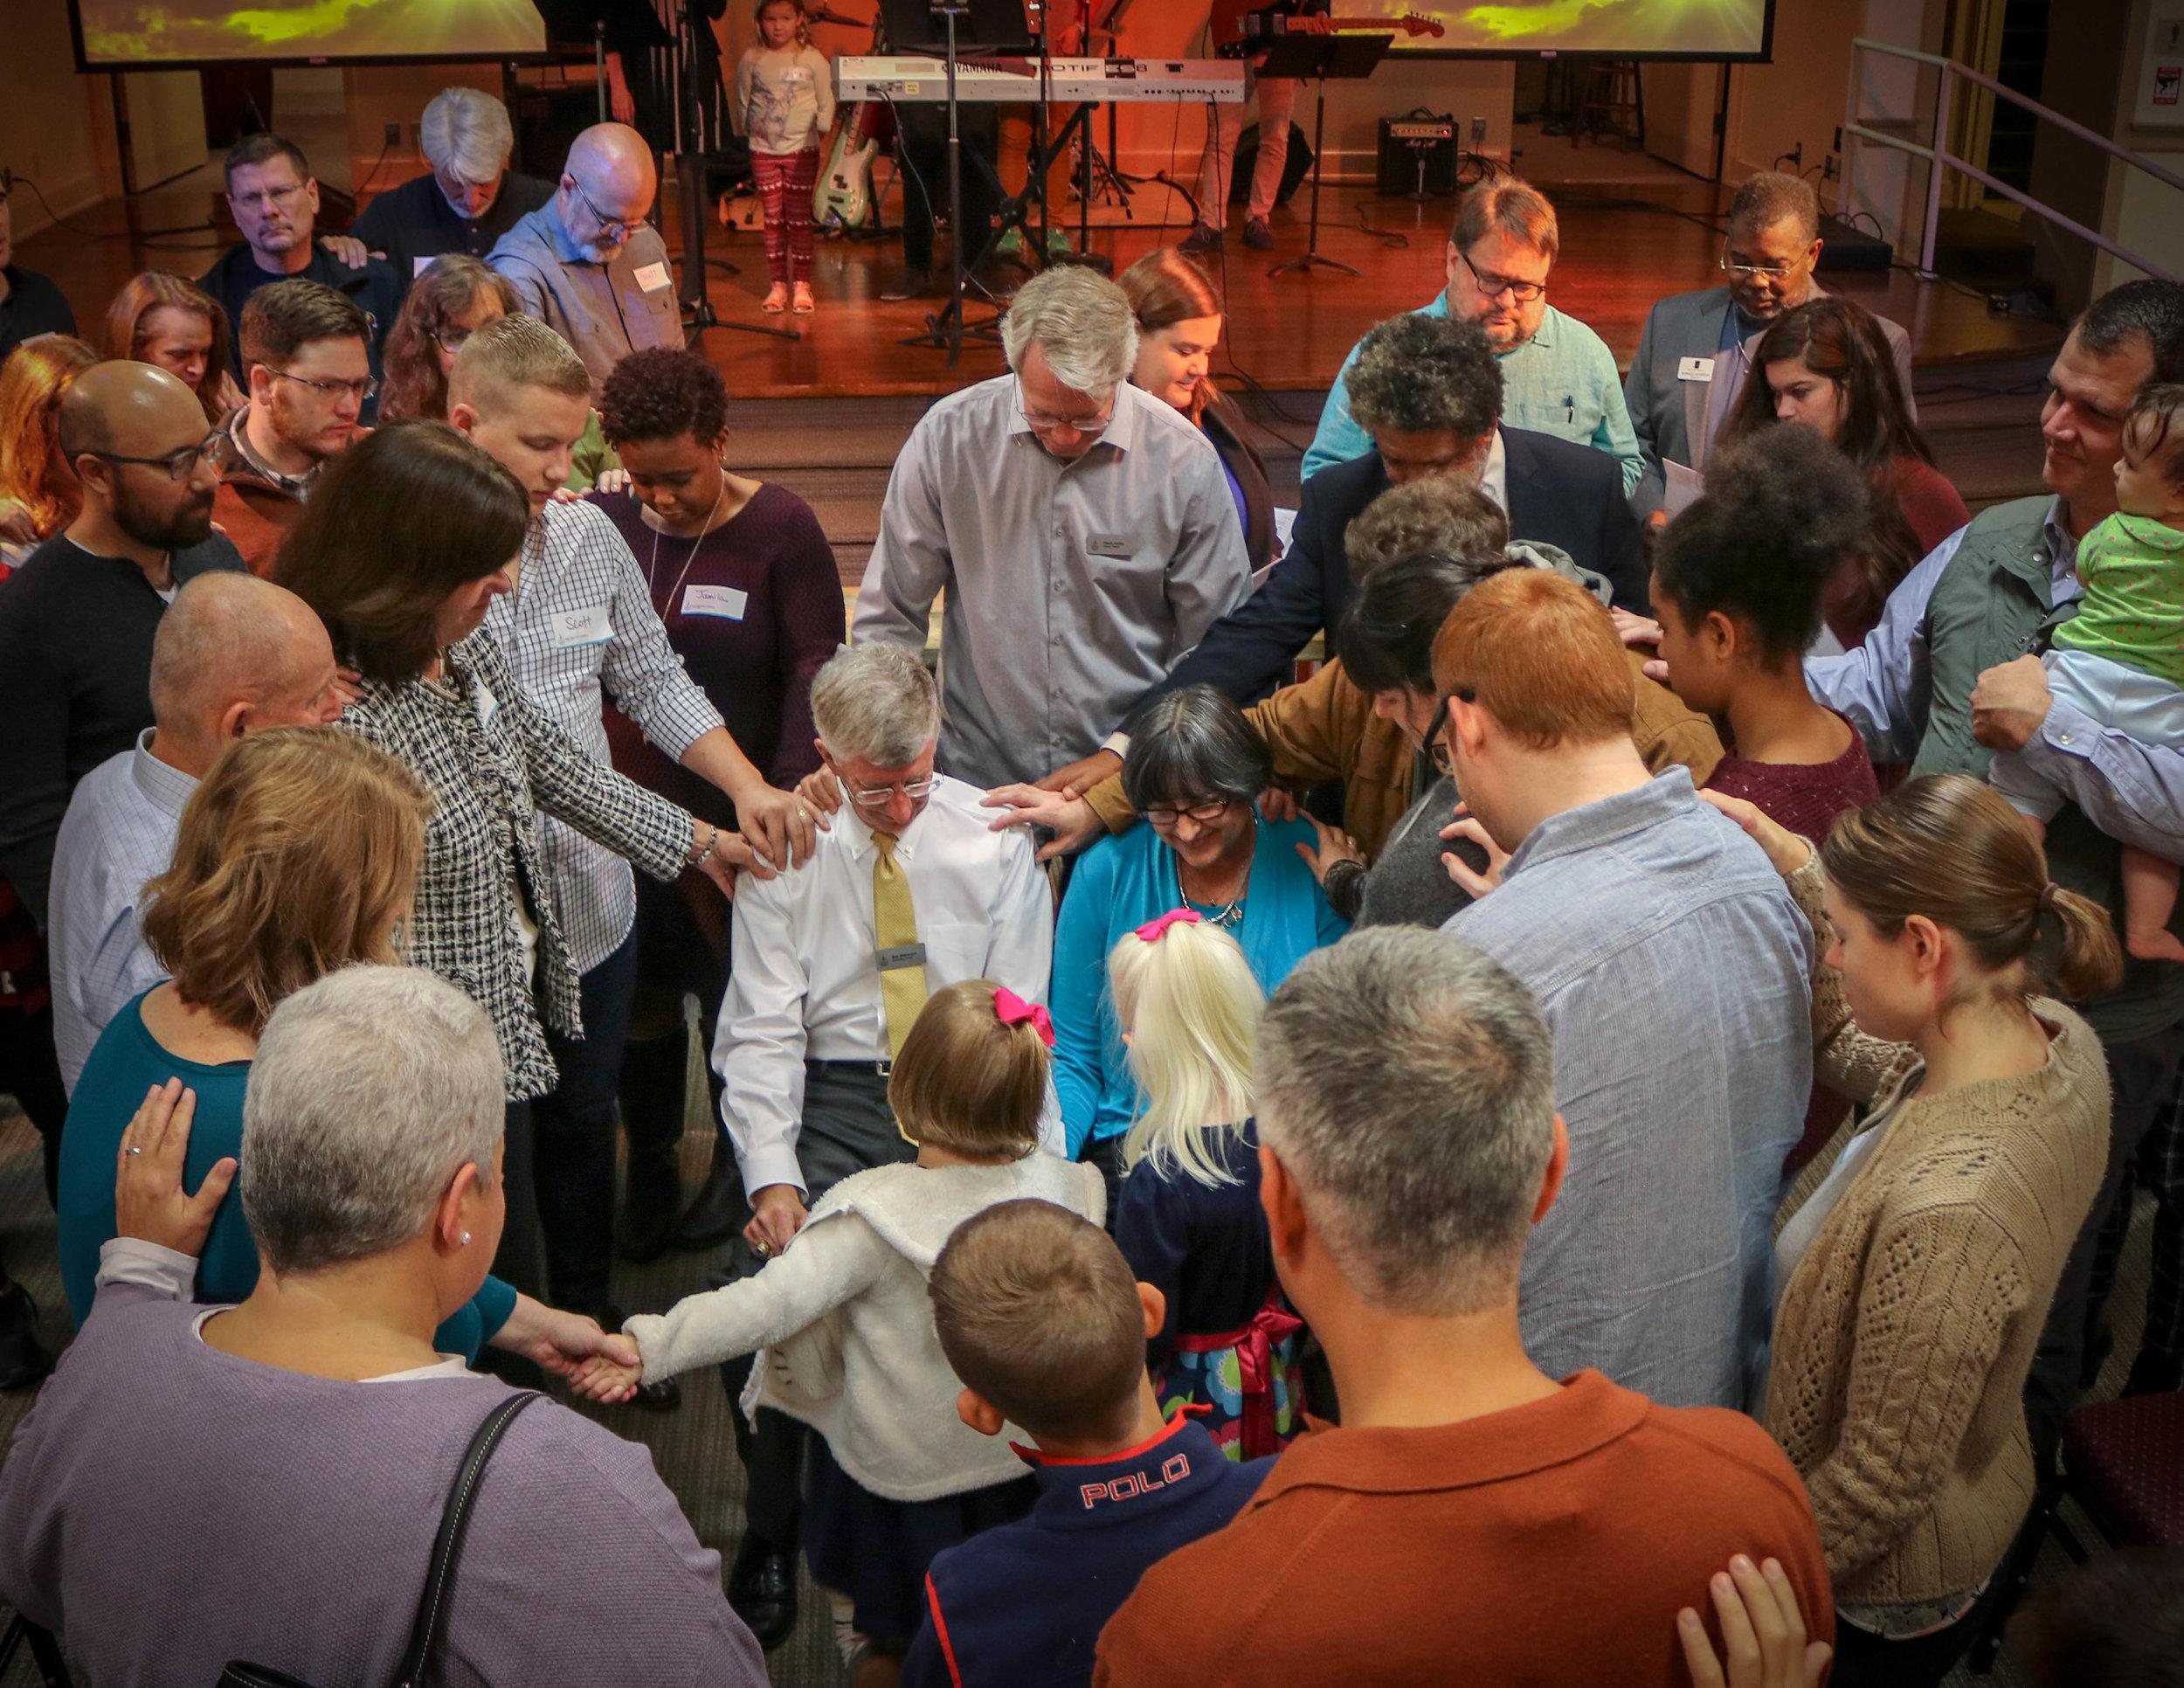 first-baptist-church-decatur-worship-bob-williamson-fresh-start-prayer.jpg